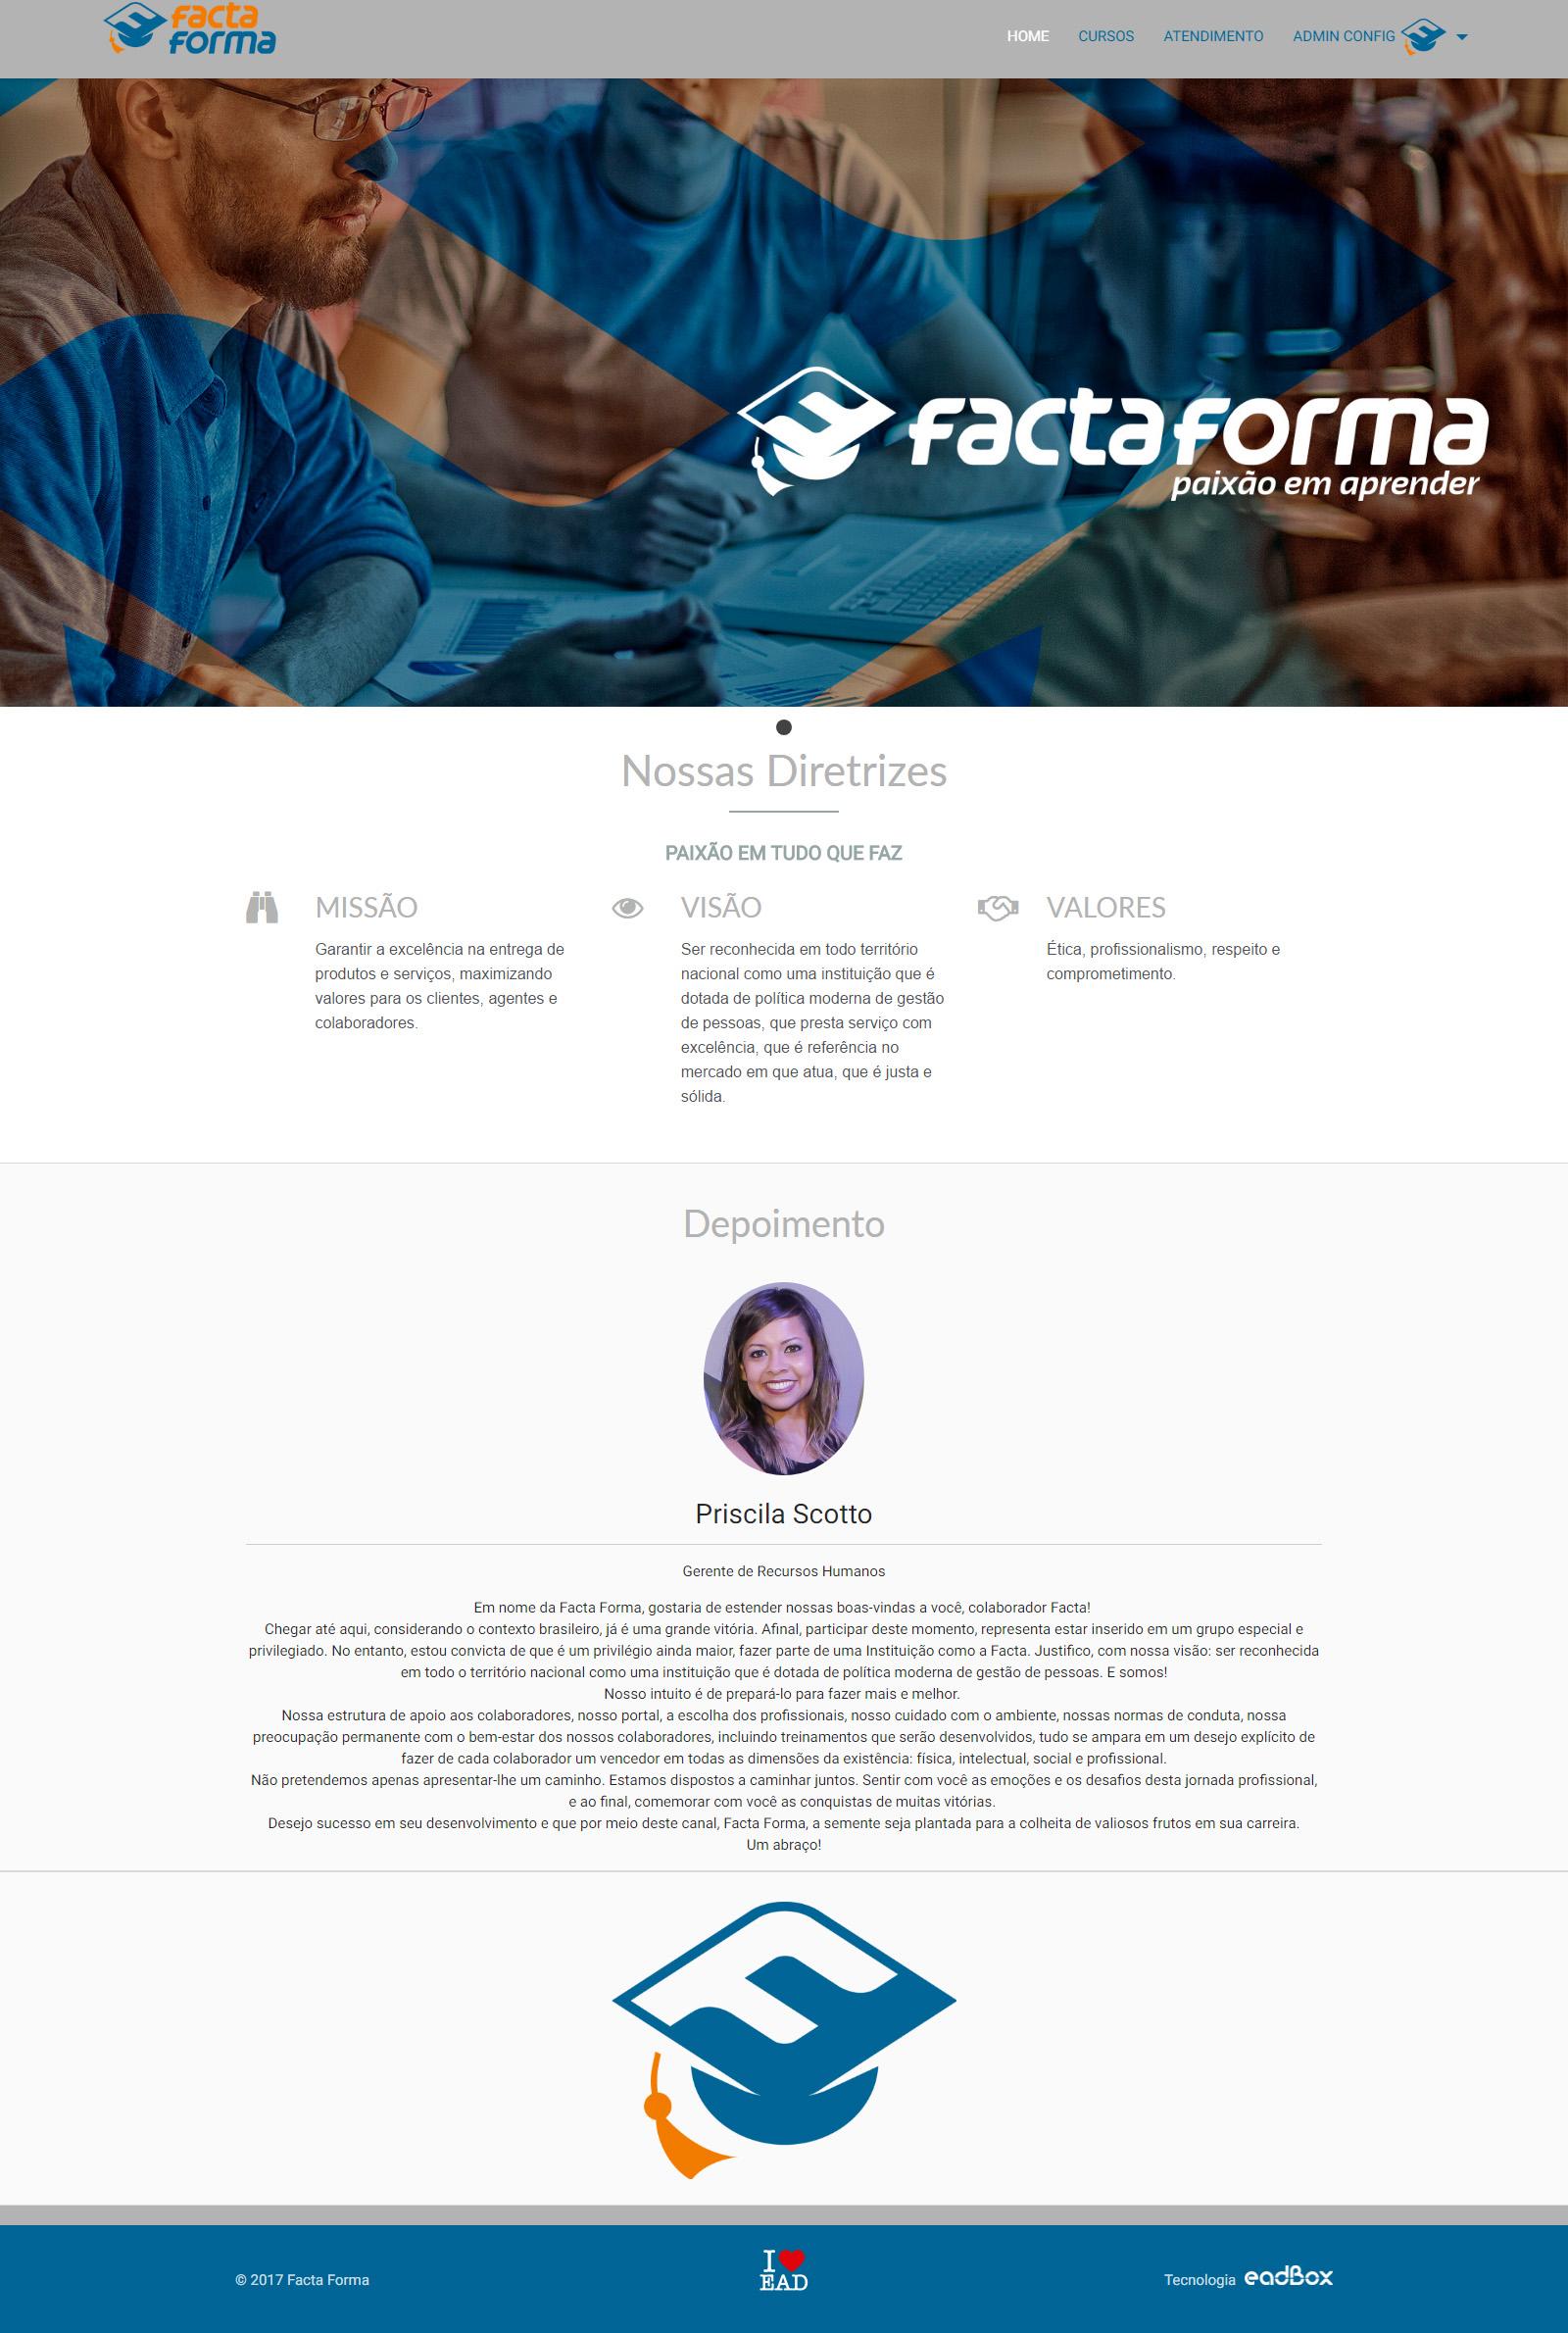 Facta Forma